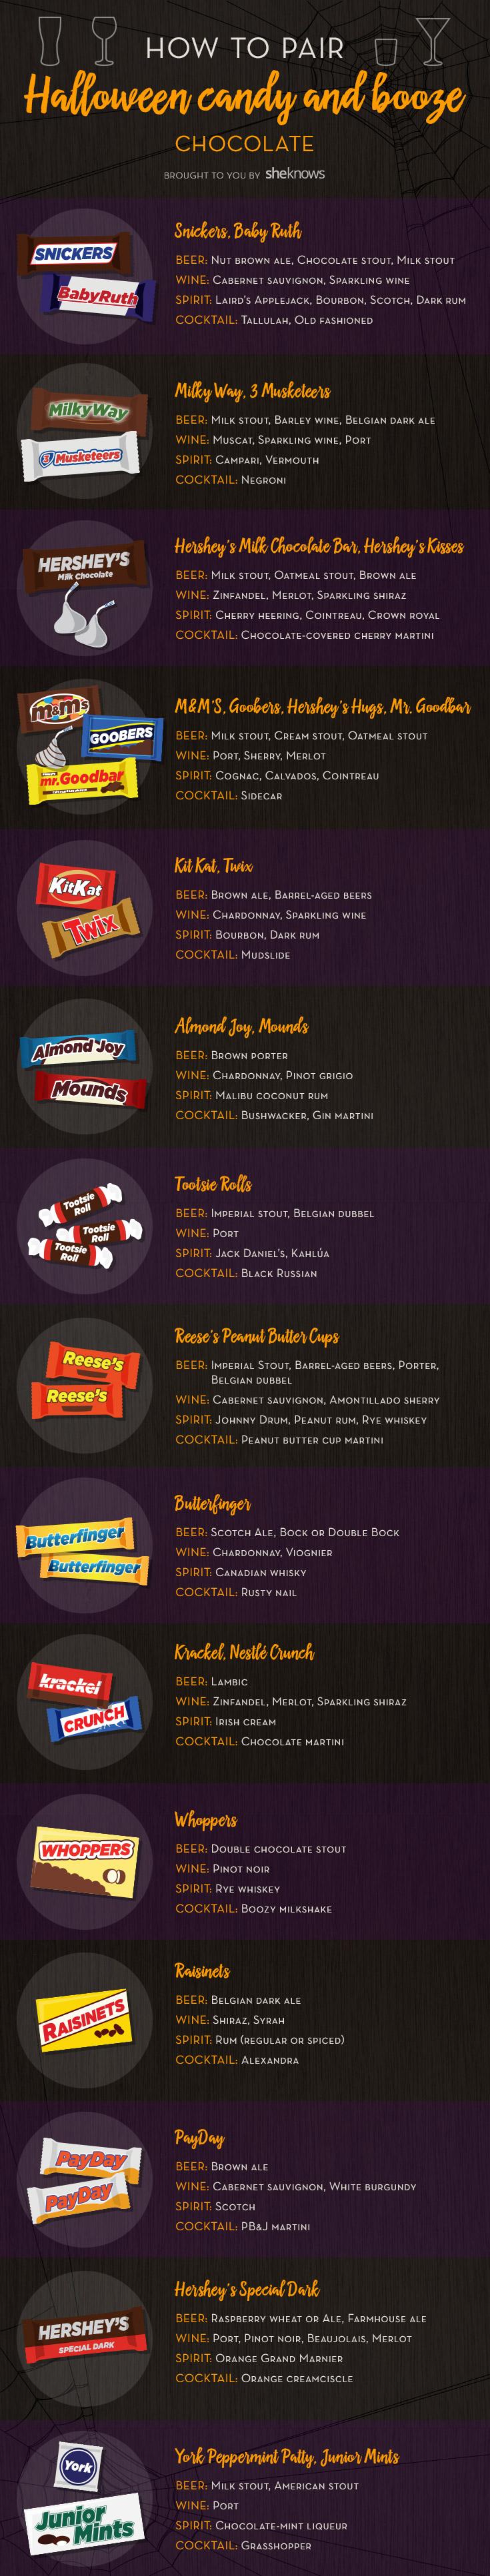 halloween candy booze pairing